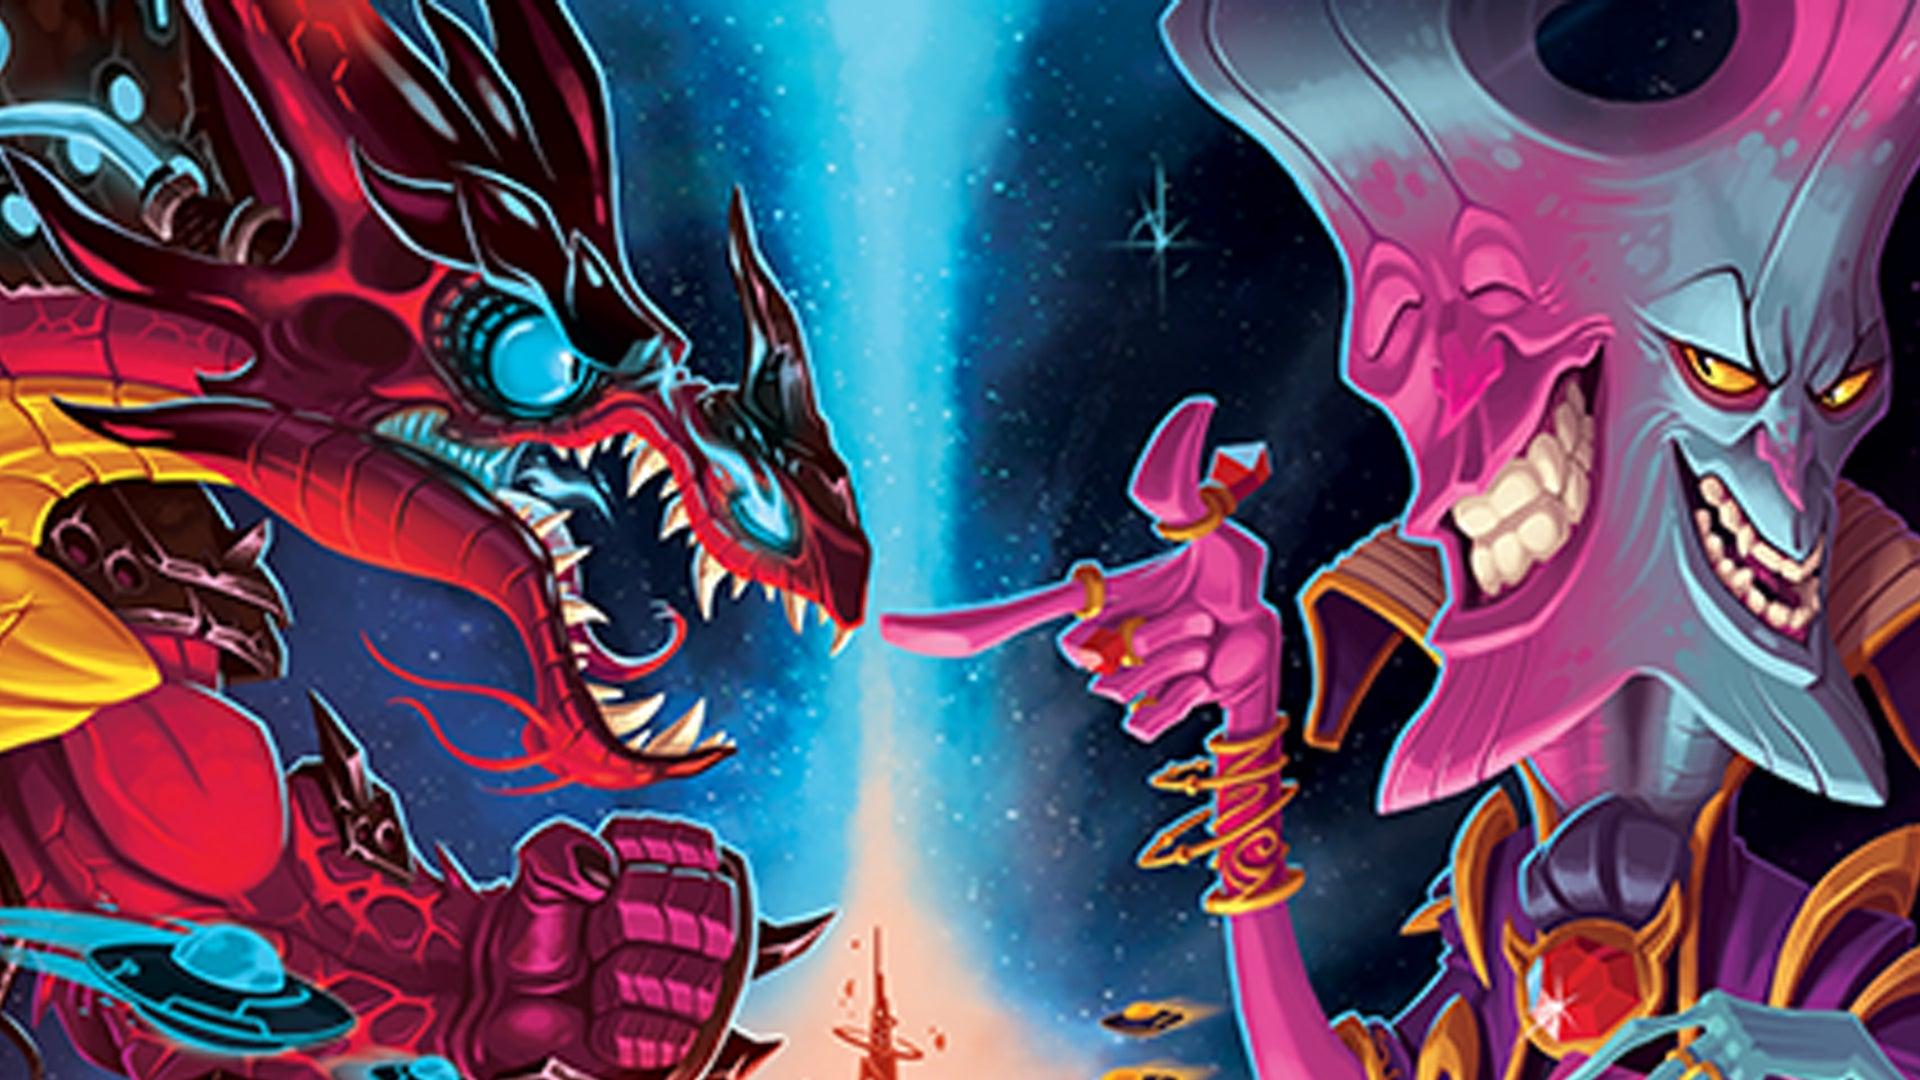 Cosmic Encounter Duel board game artwork